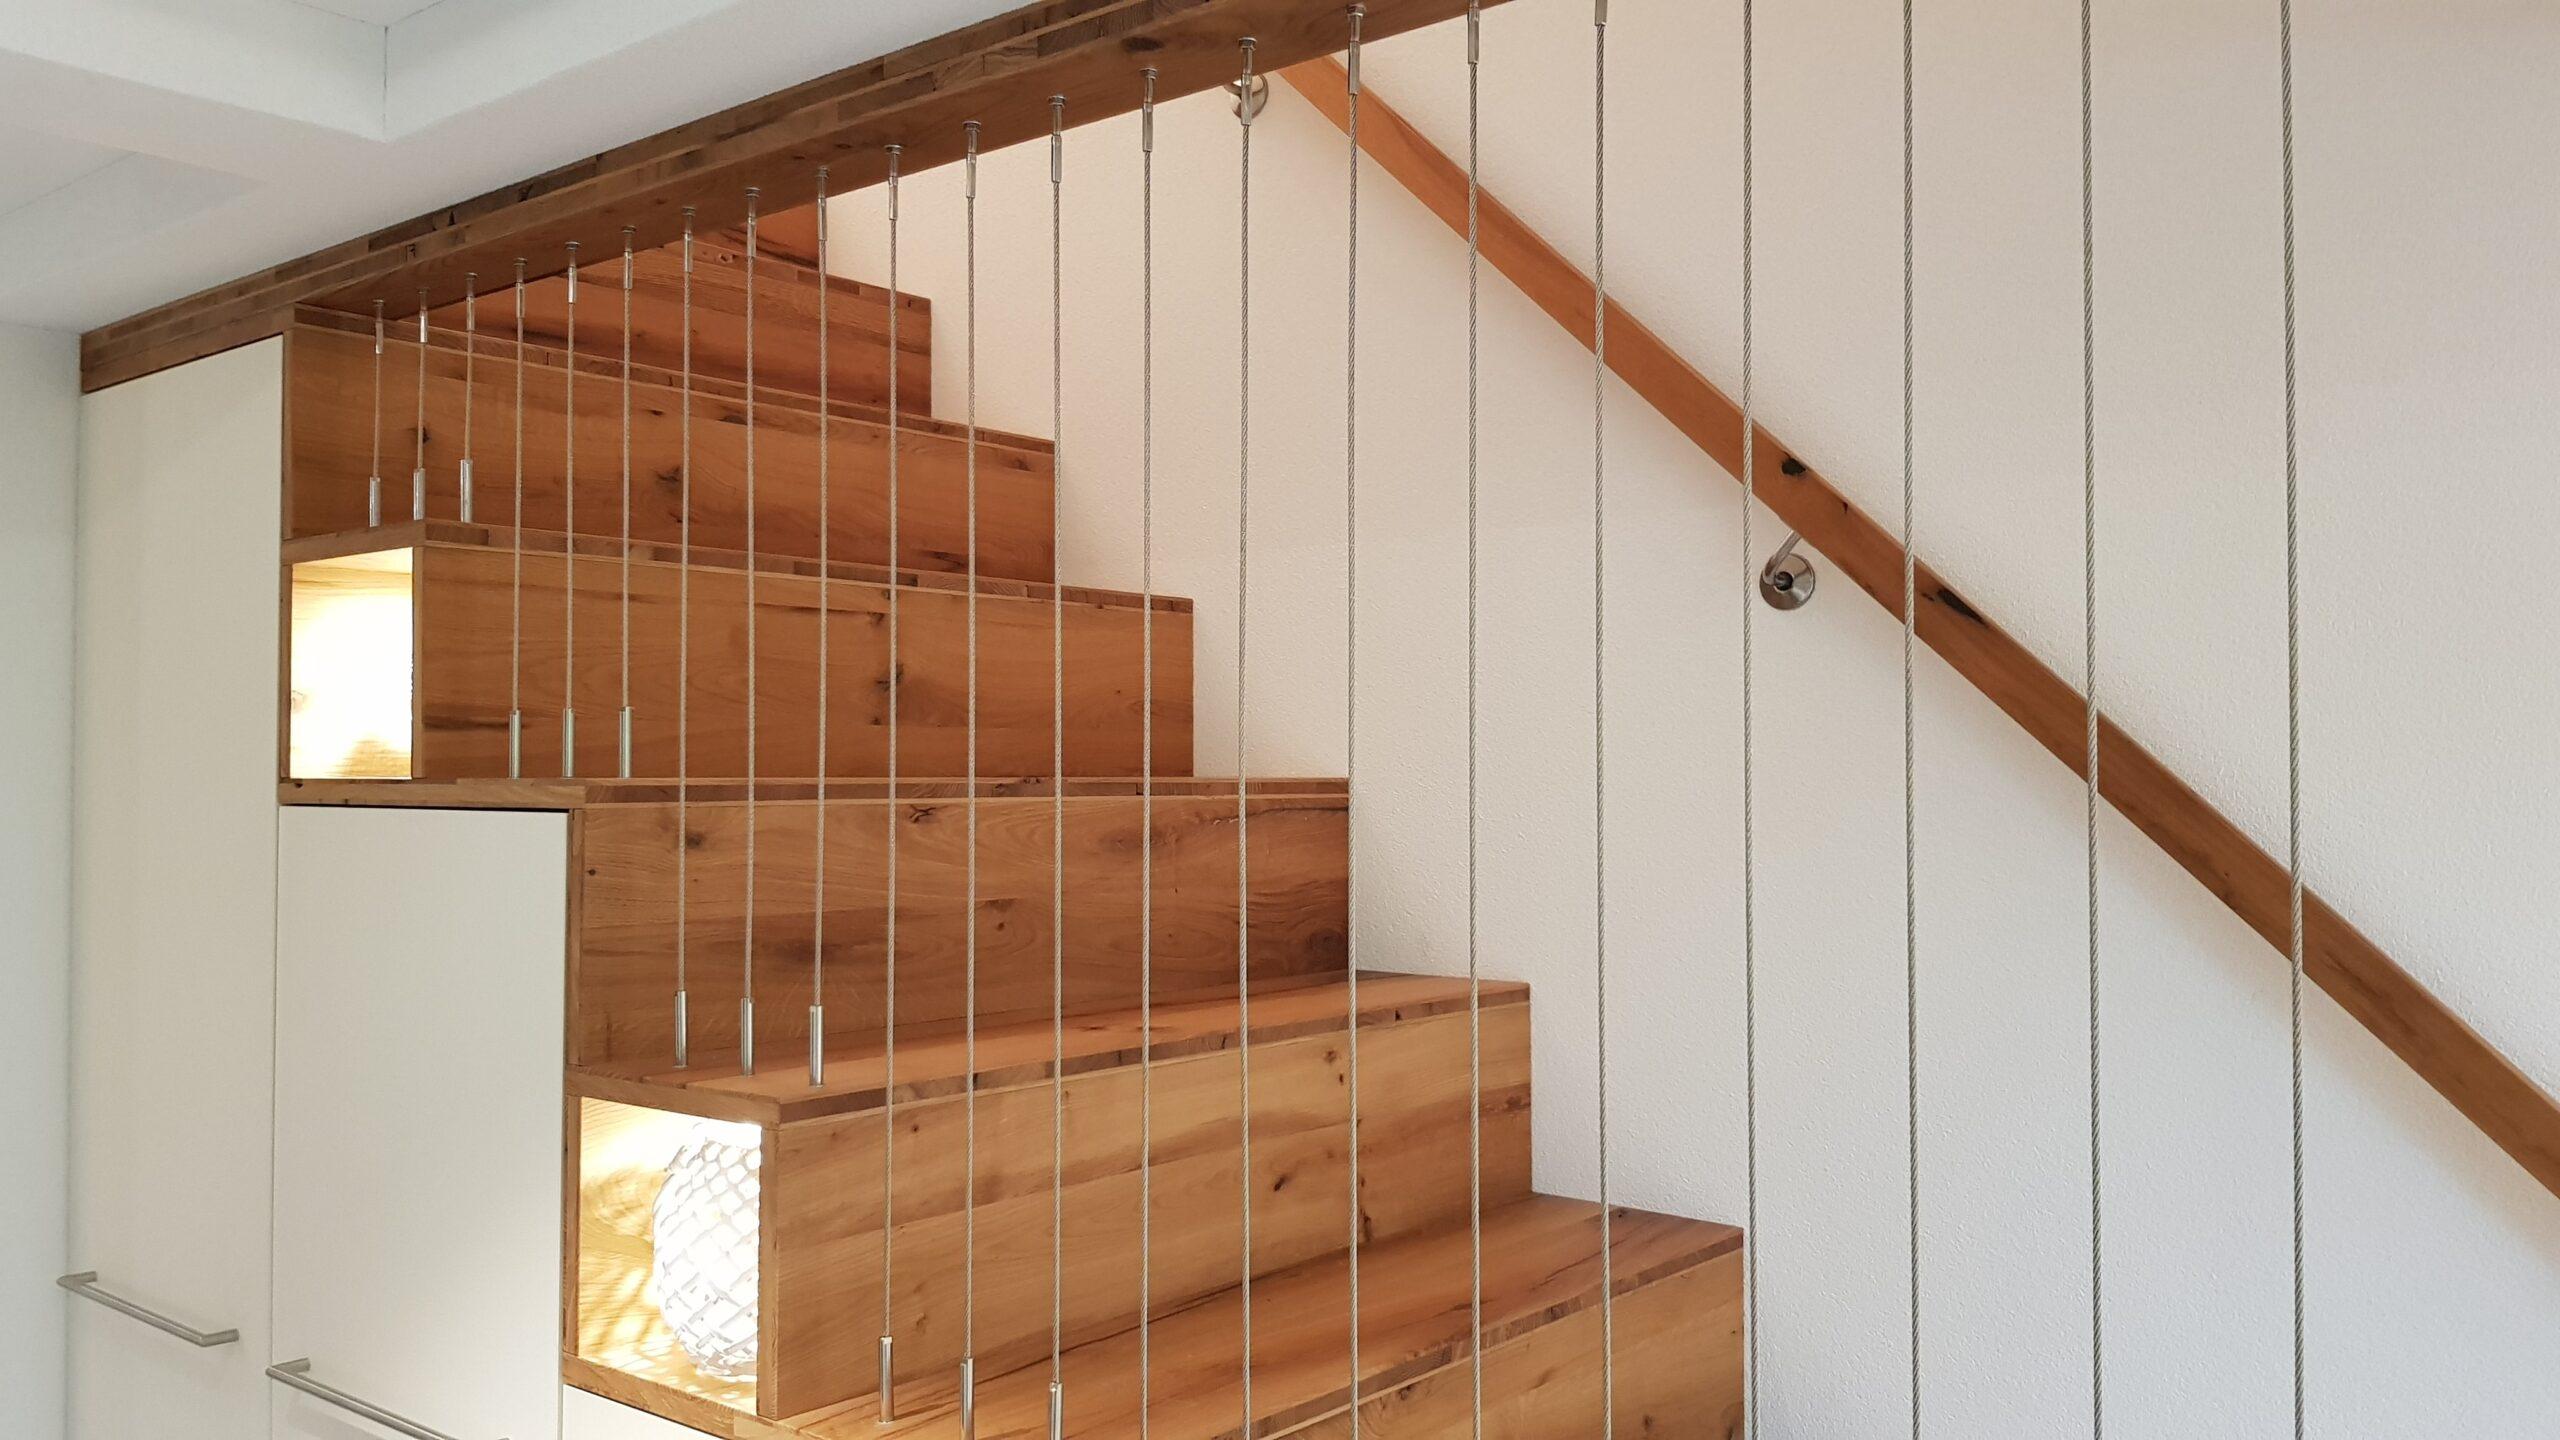 Wooddesign_Treppen_Teppengeländer_Holztreppen_Treppenverkleidung_Treppenmöbel (5)-min